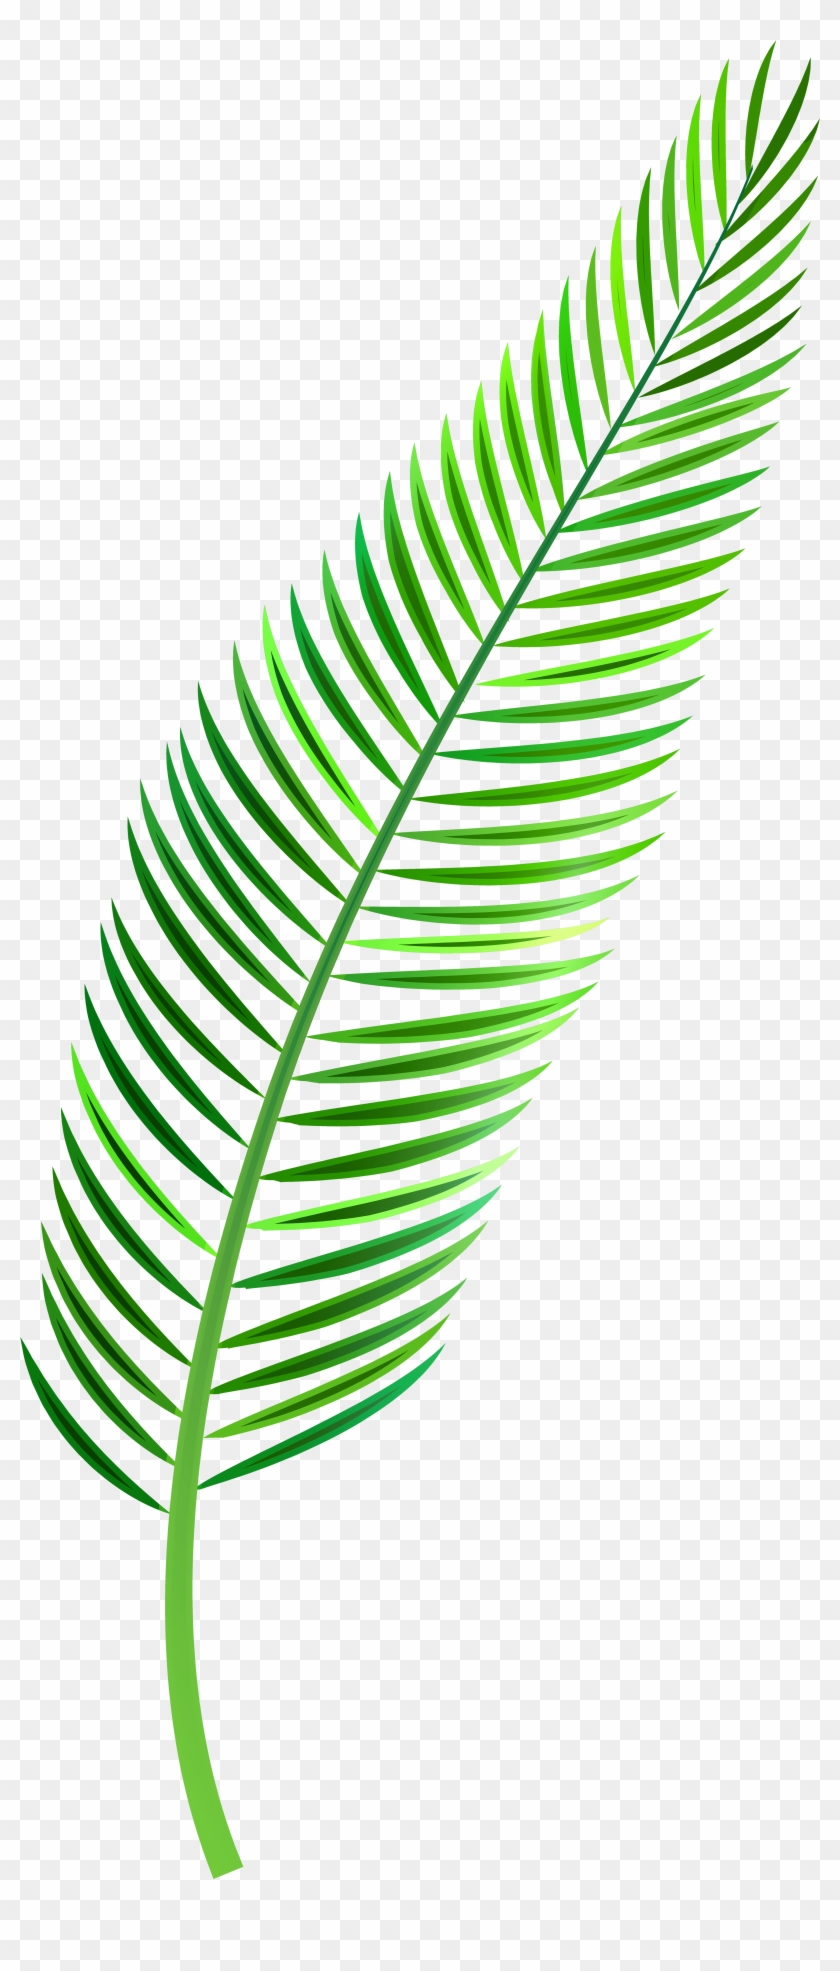 Palm Leaf Png Clip Art - Palm Leaf Clipart Png Transparent Png #28305